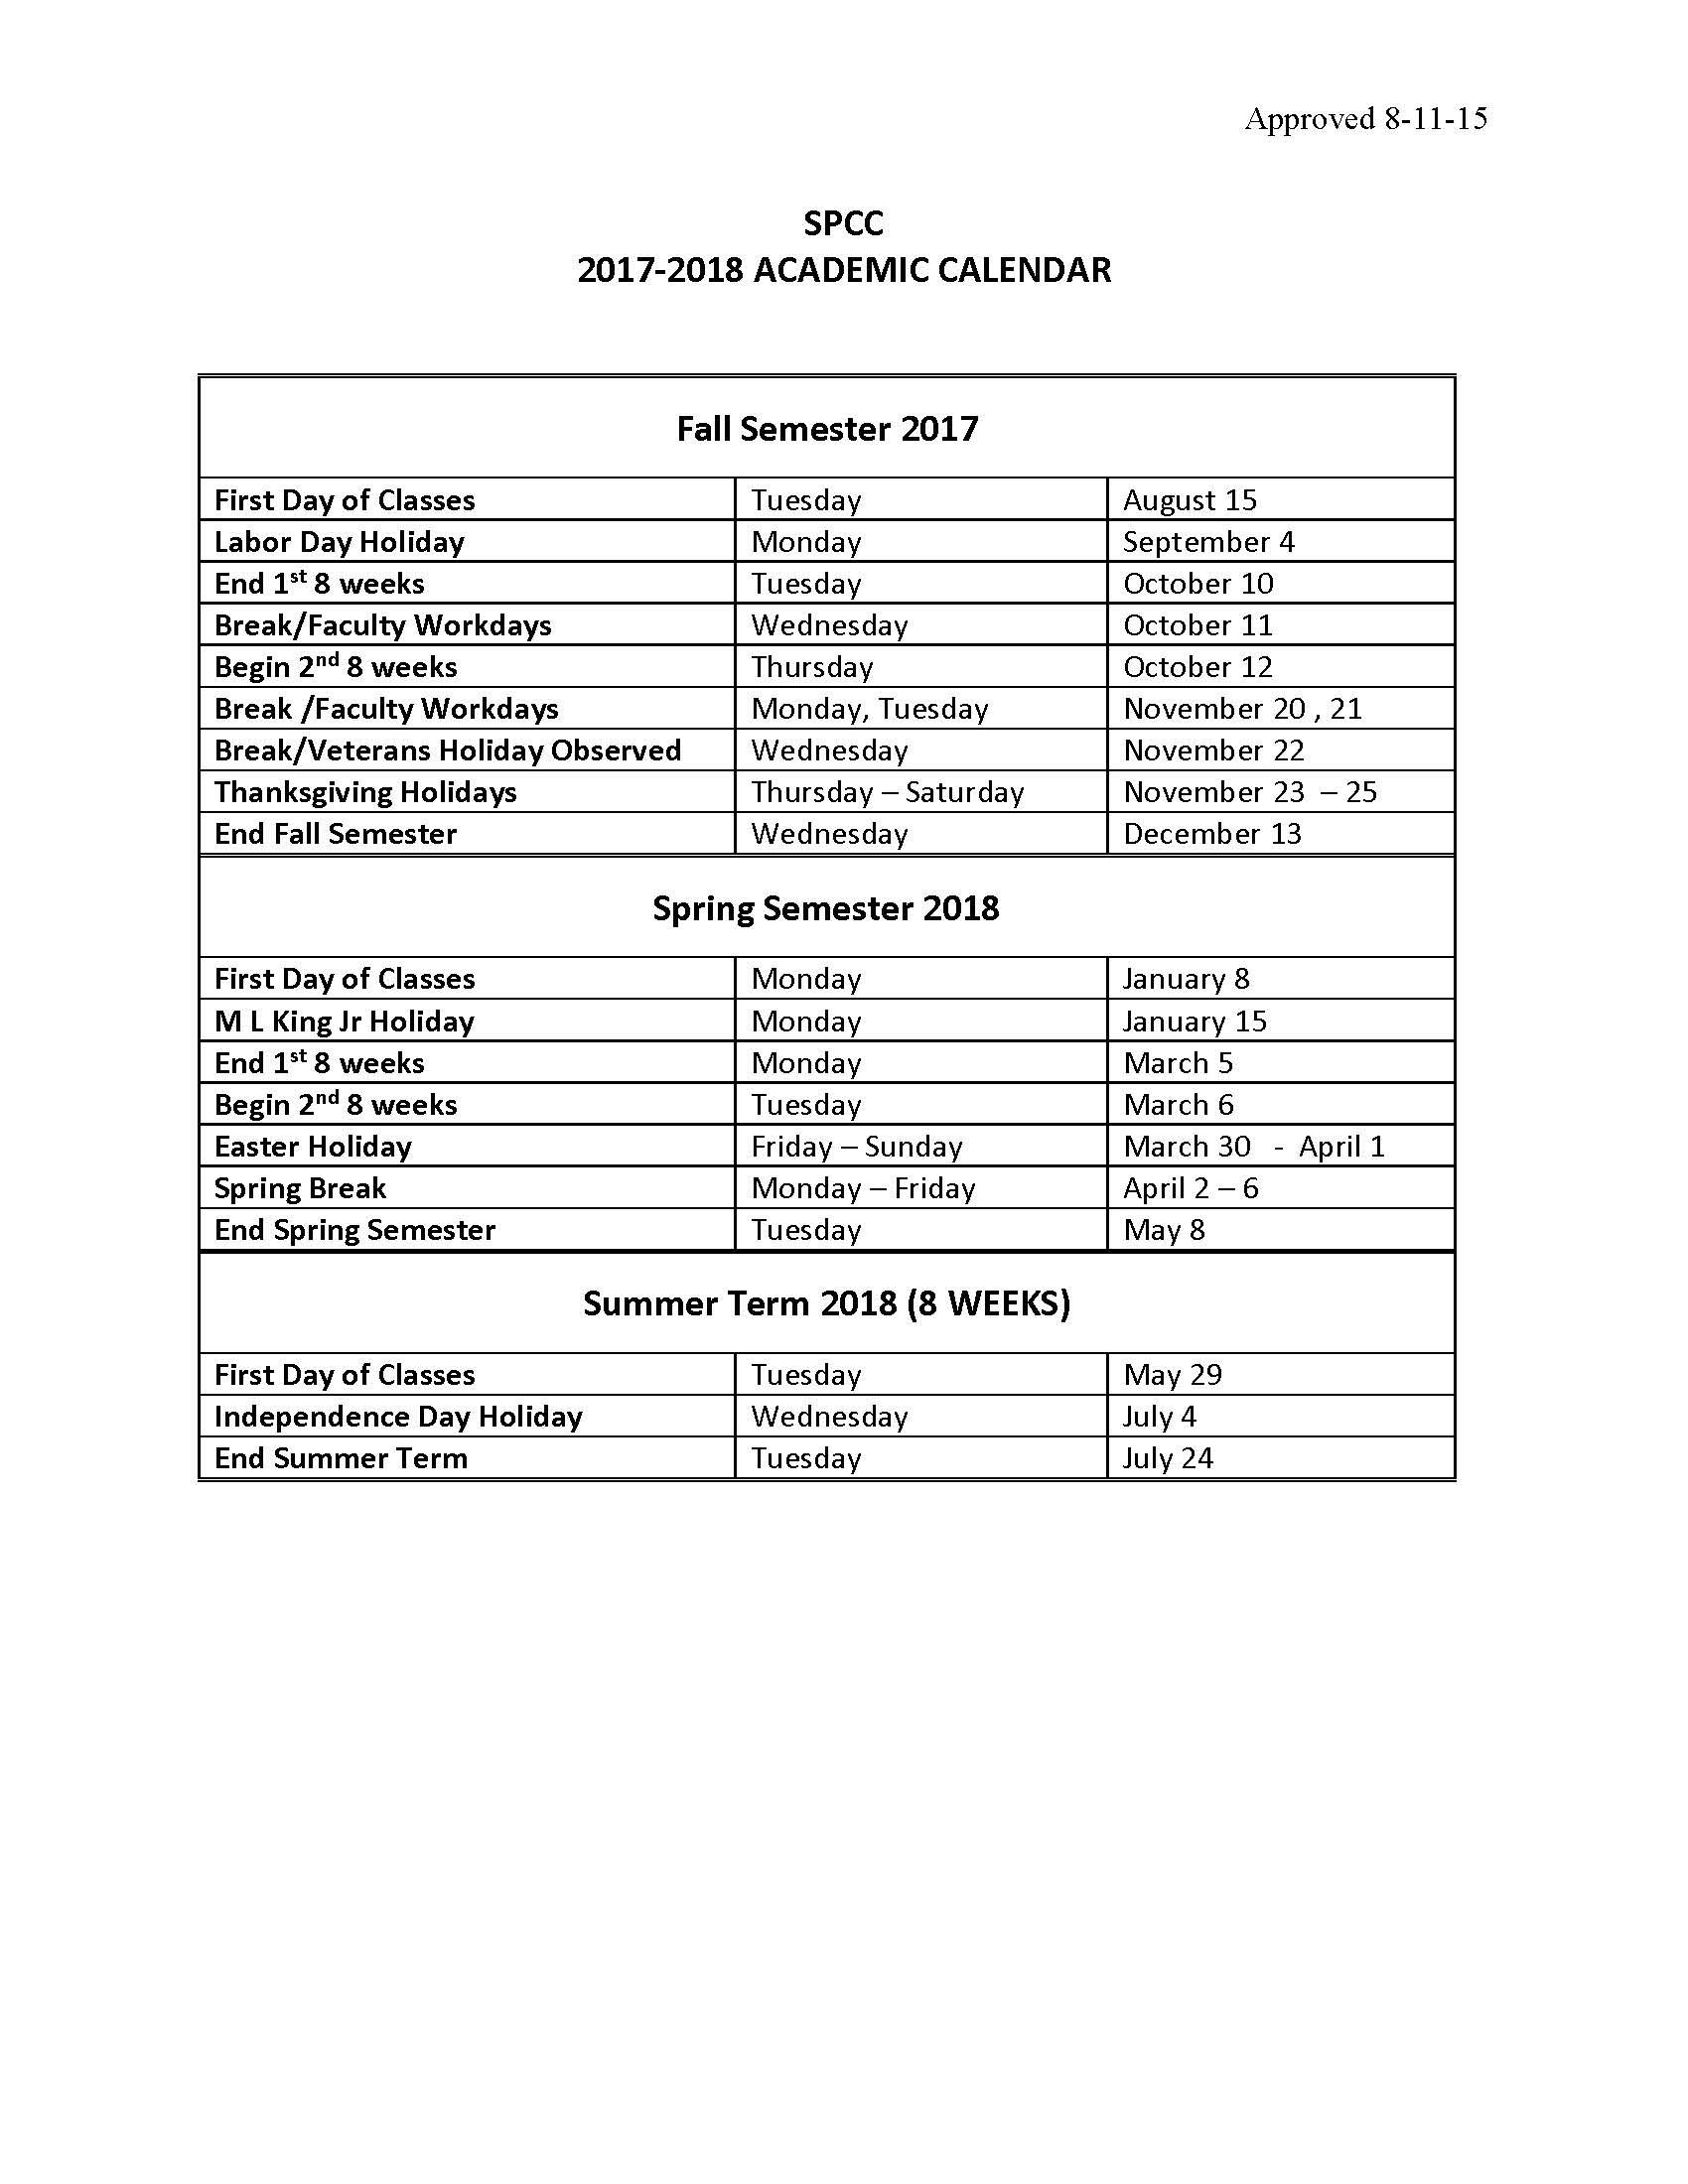 Calendar | South Piedmont Community College